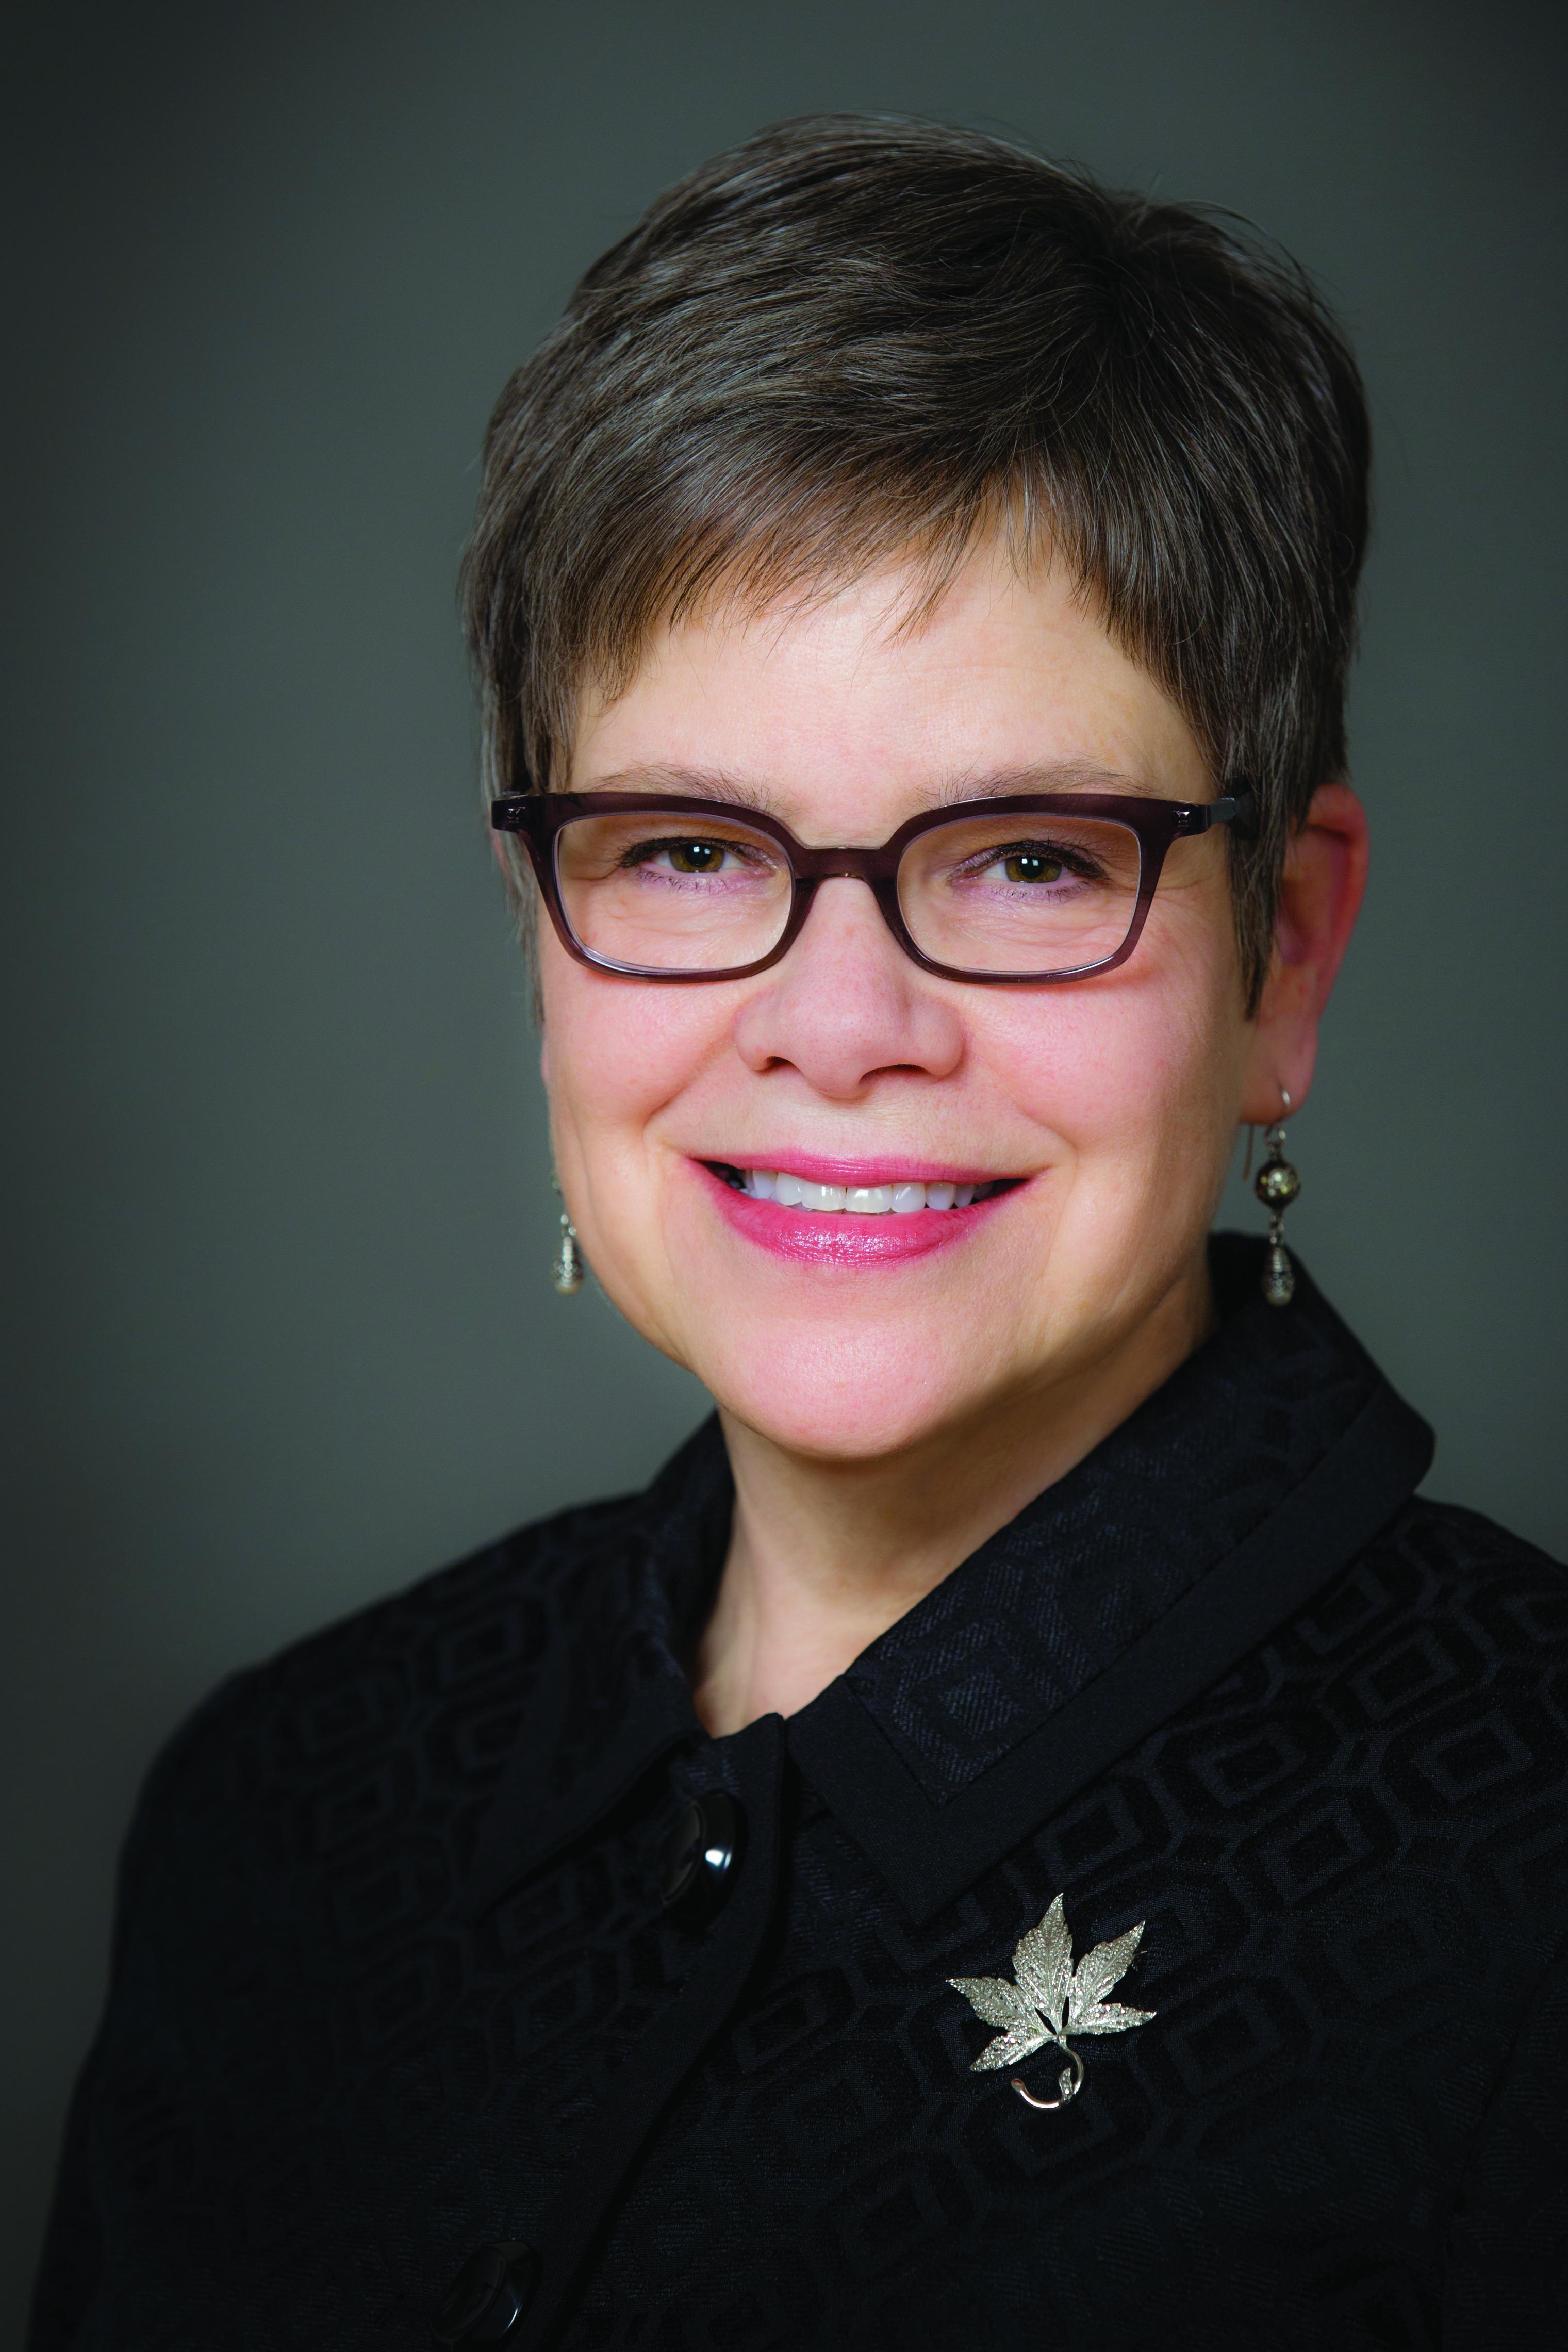 KCAD President Leslie Bellavance